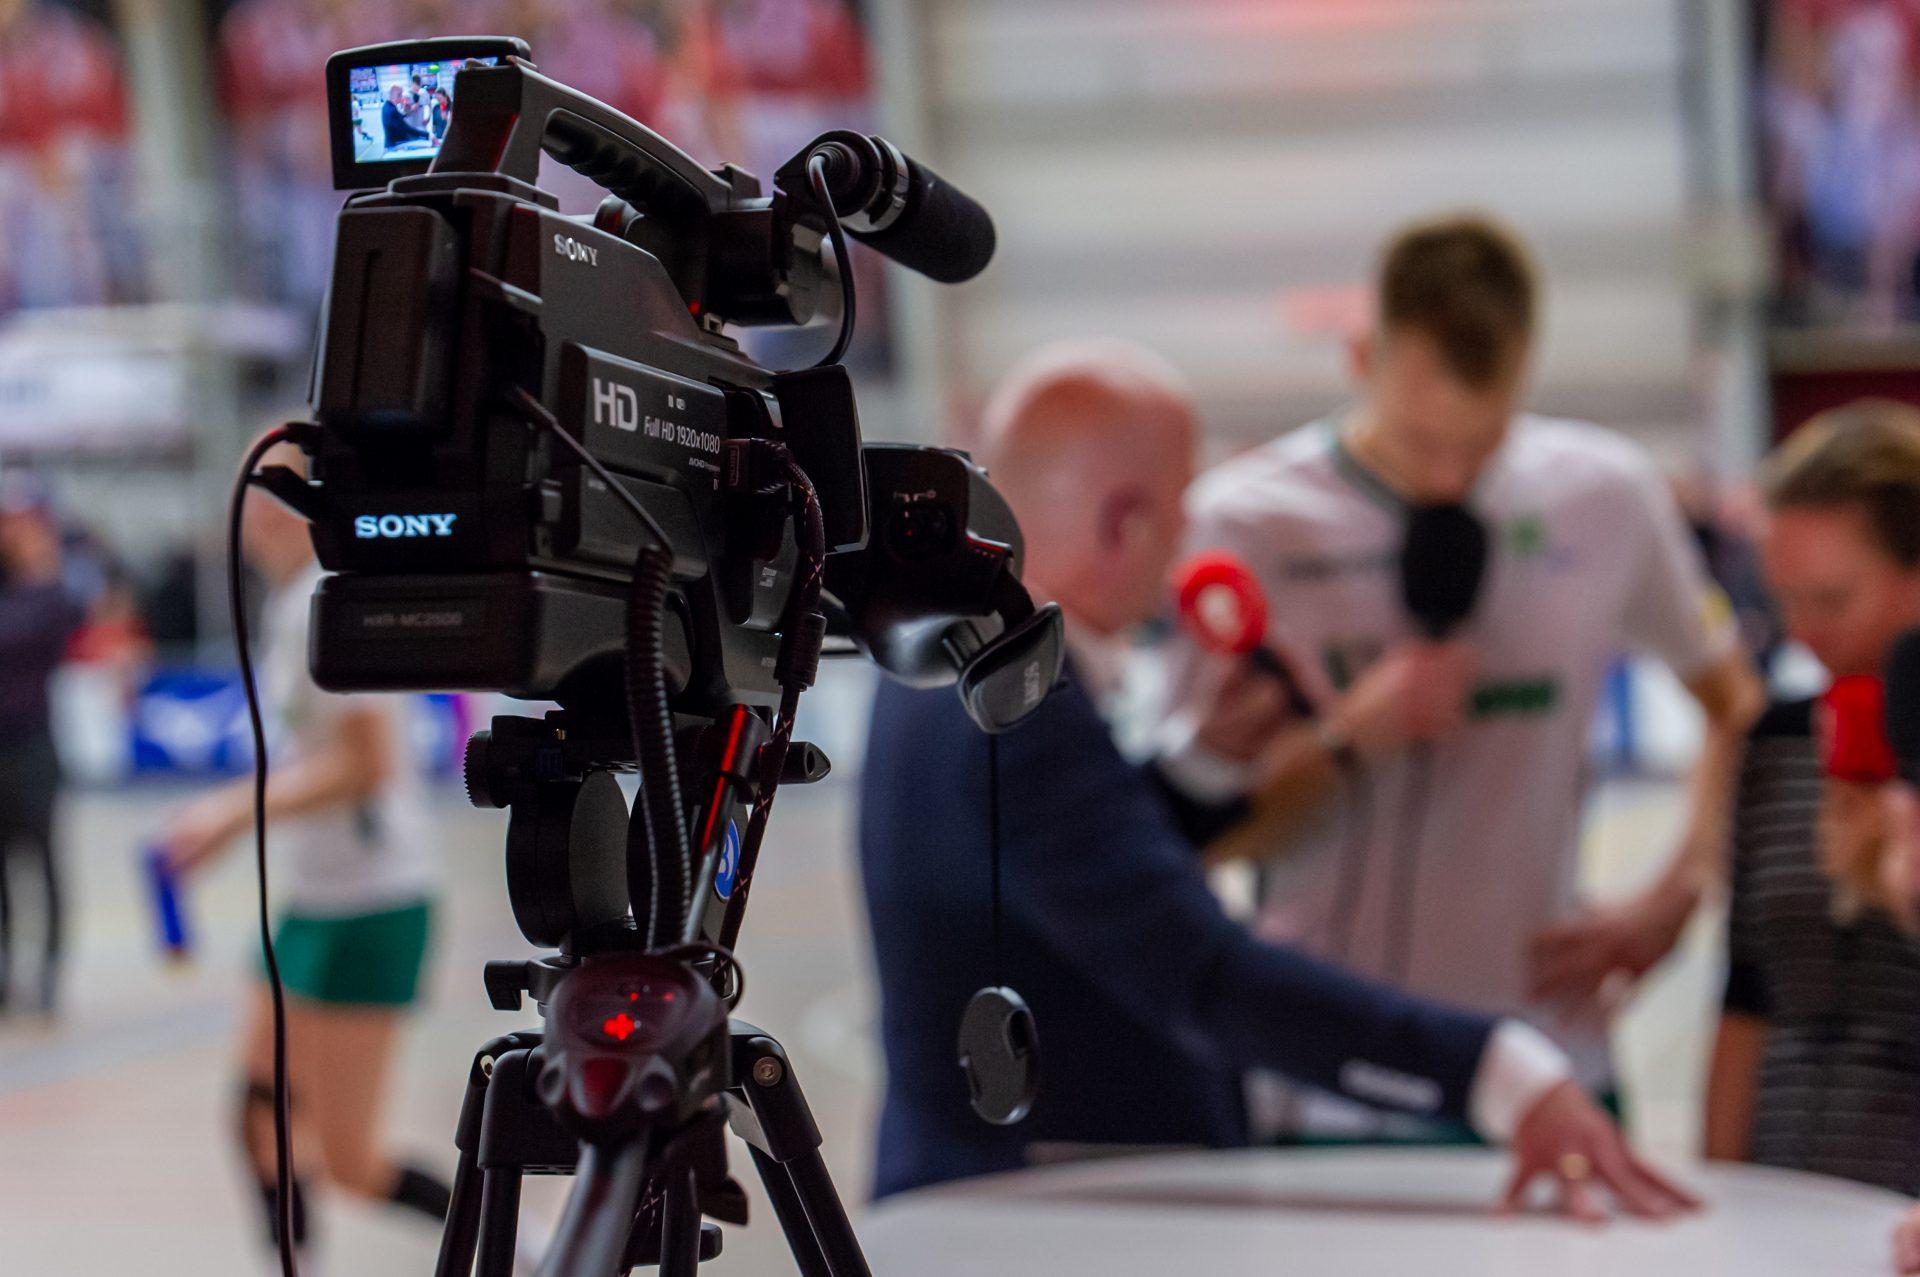 Korfbal League start online korfbalplatform met Eyecons